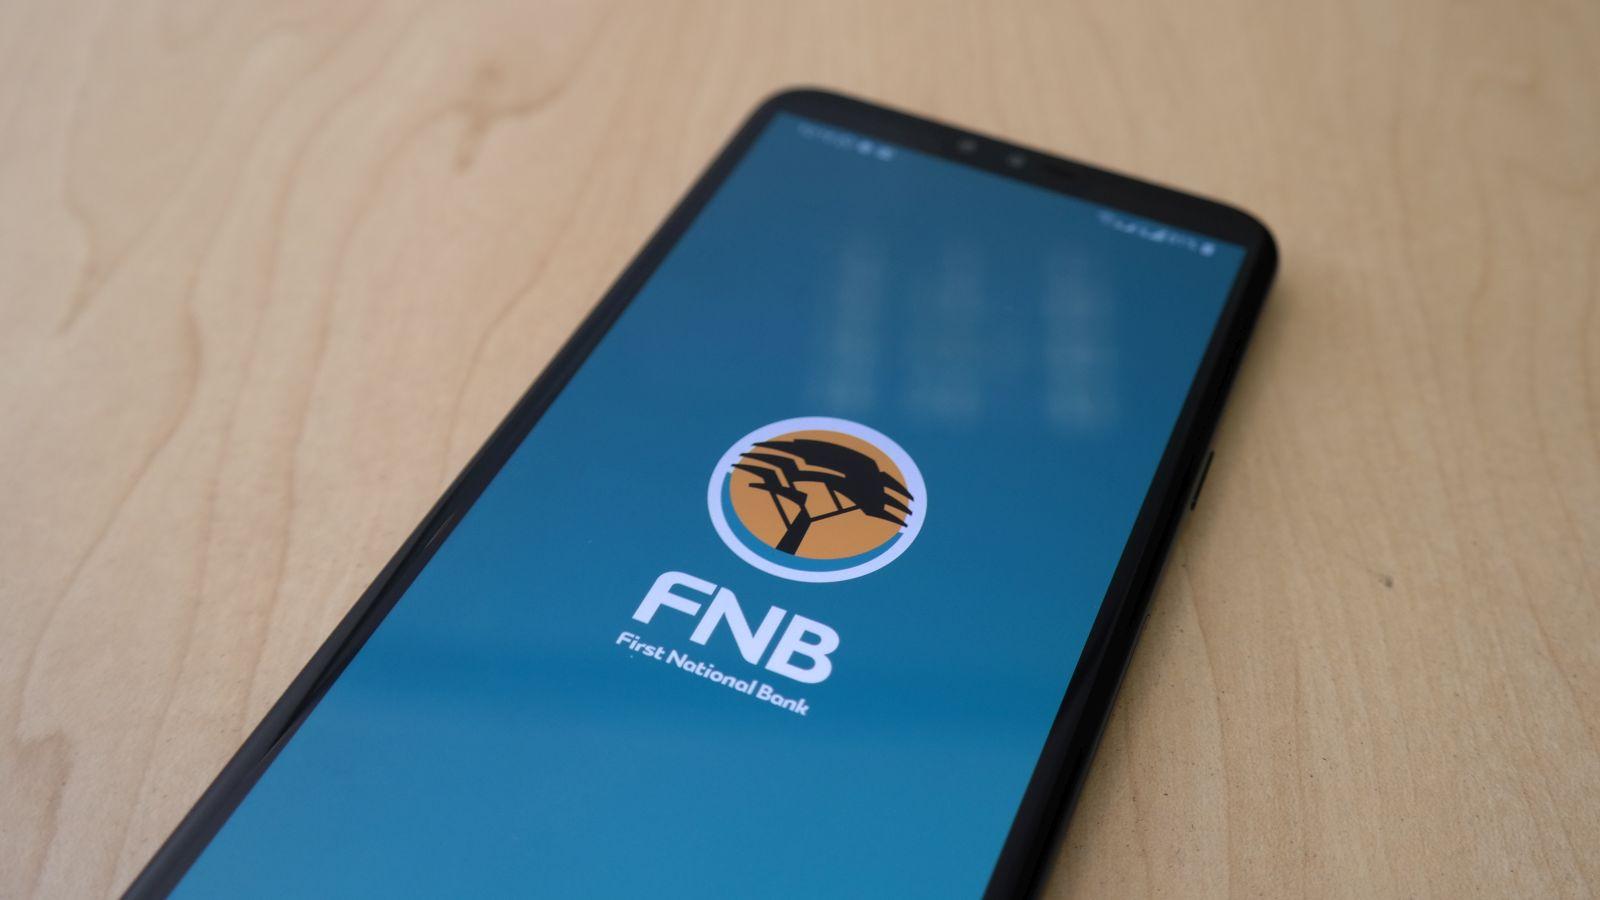 FNB's banking app is now also a virtual eBucks shopping mall - Memeburn